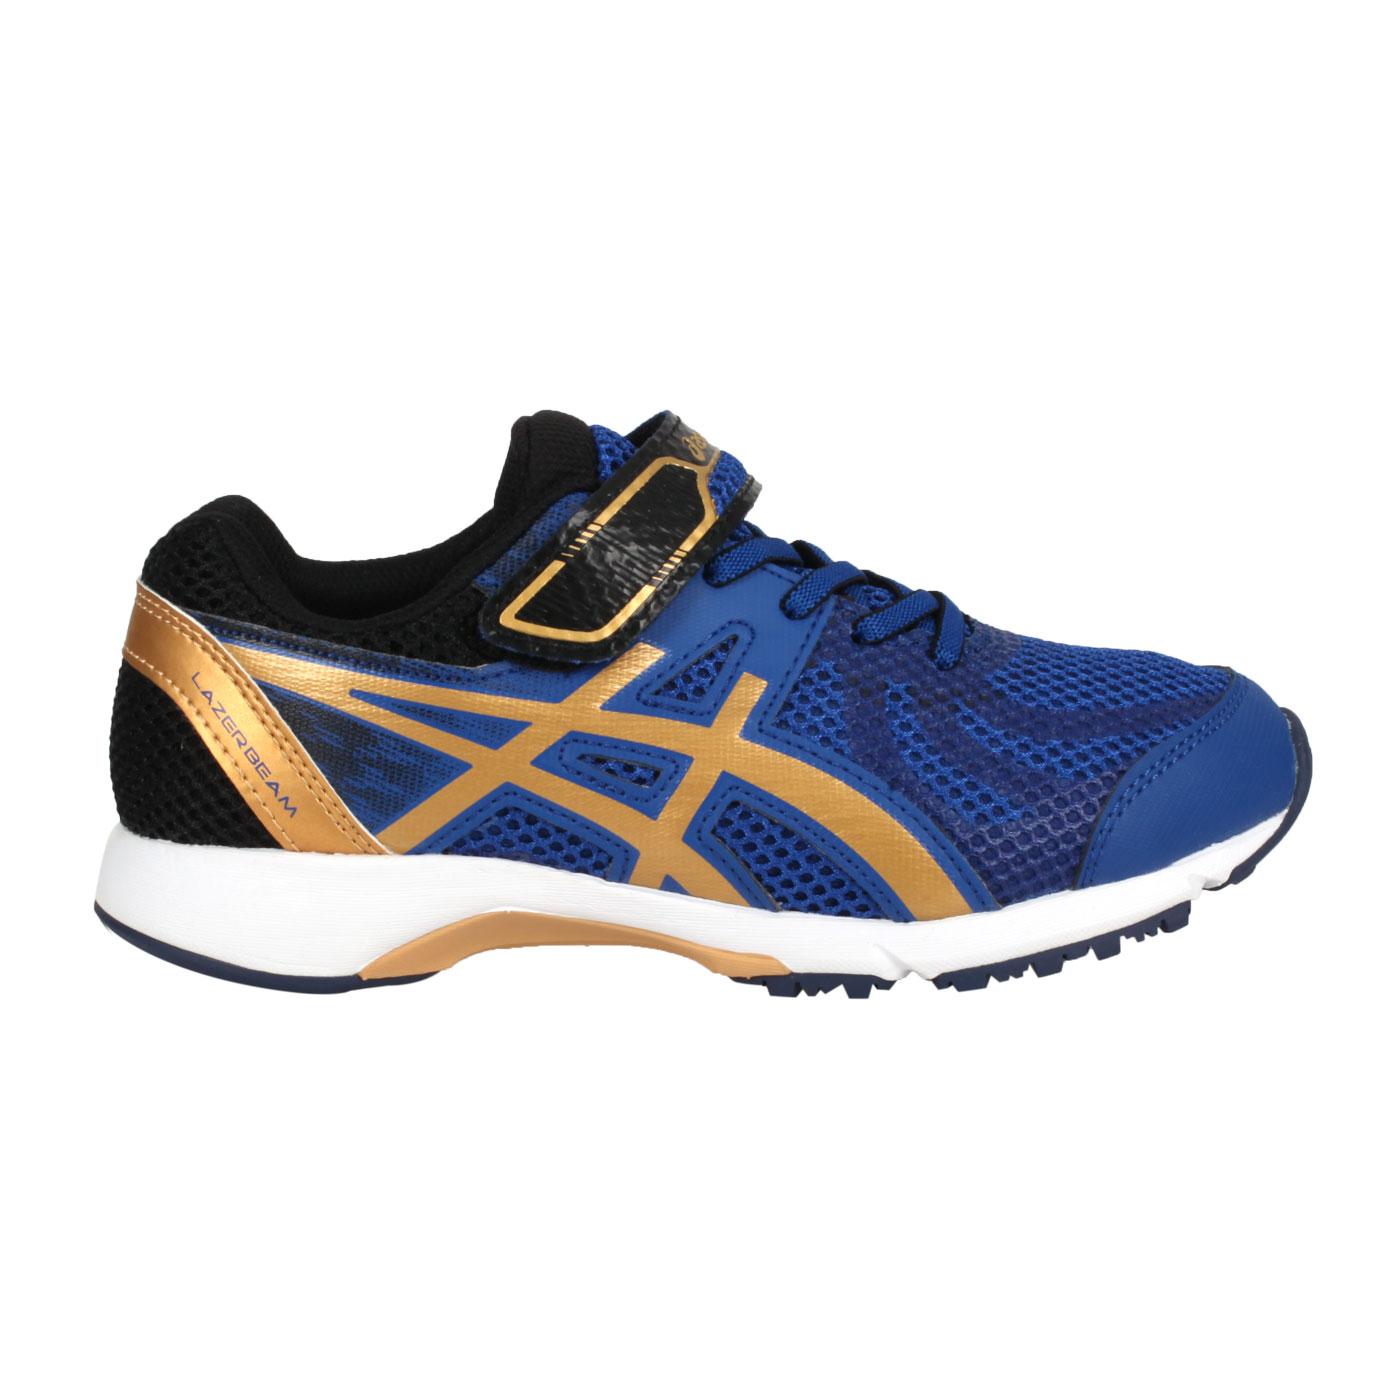 ASICS 大童運動鞋  @LAZERBAM RE-MG@1154A053-400 - 藍黑金